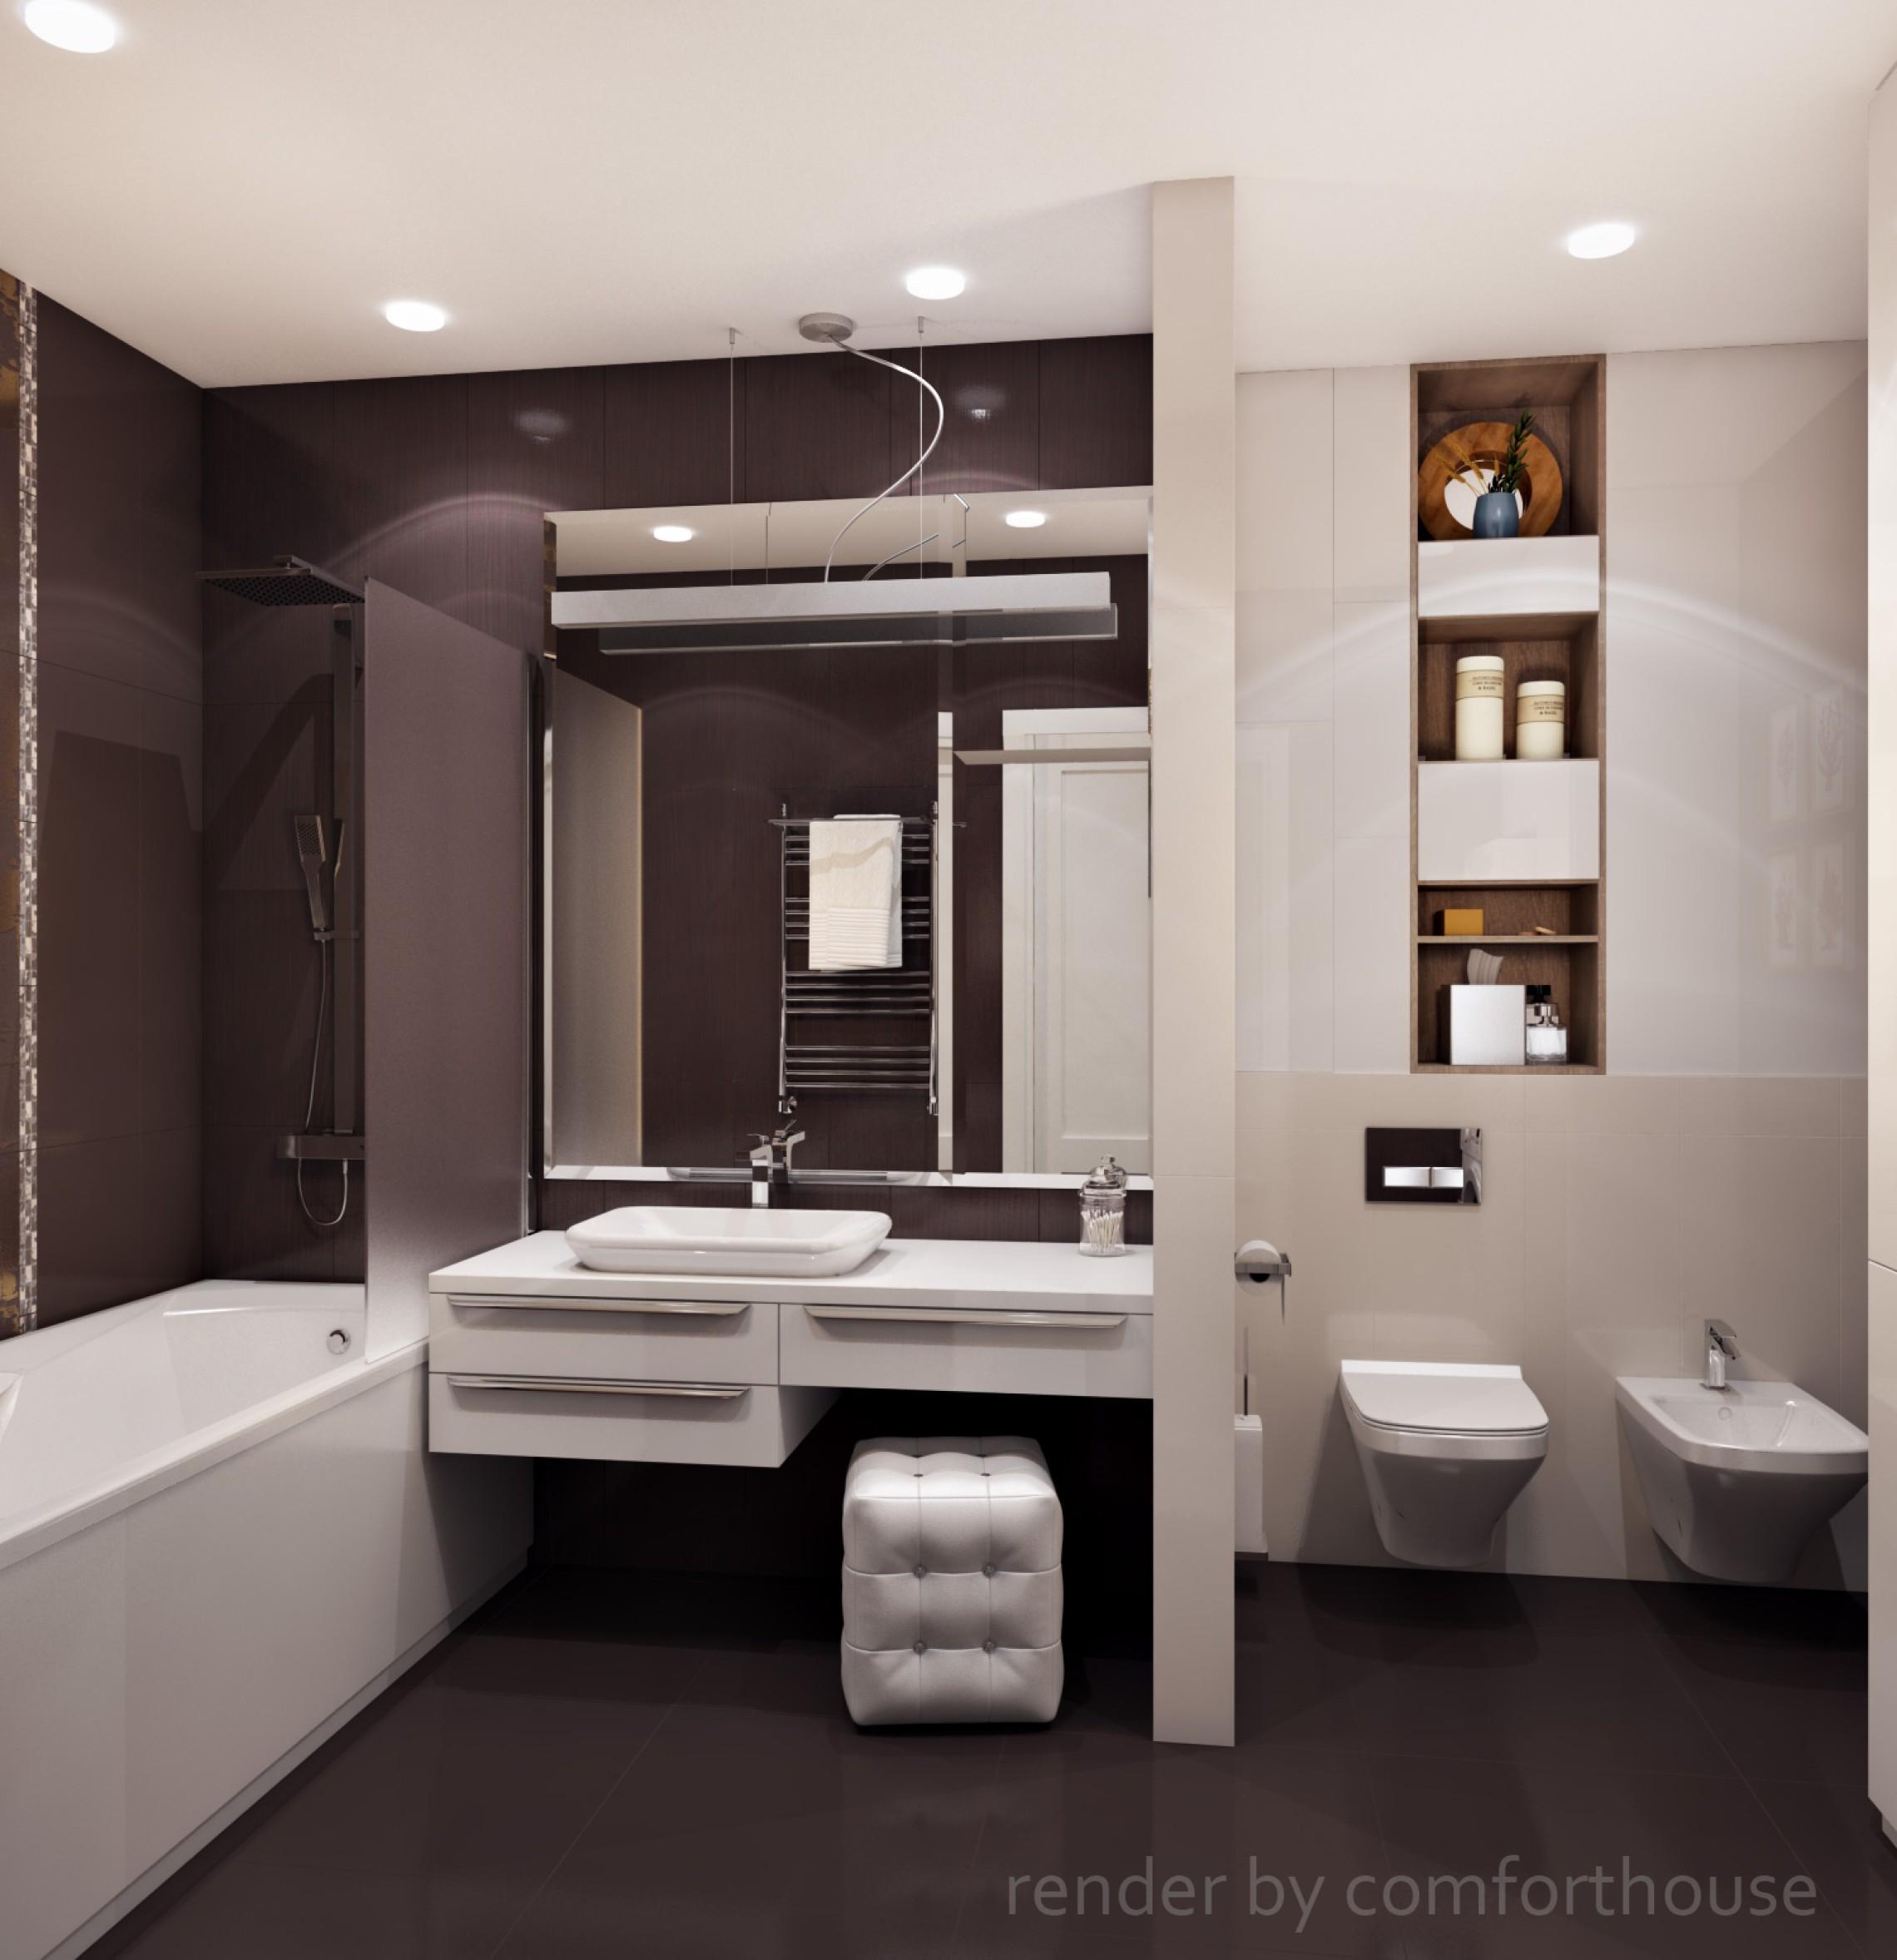 Modern light interior bathroom